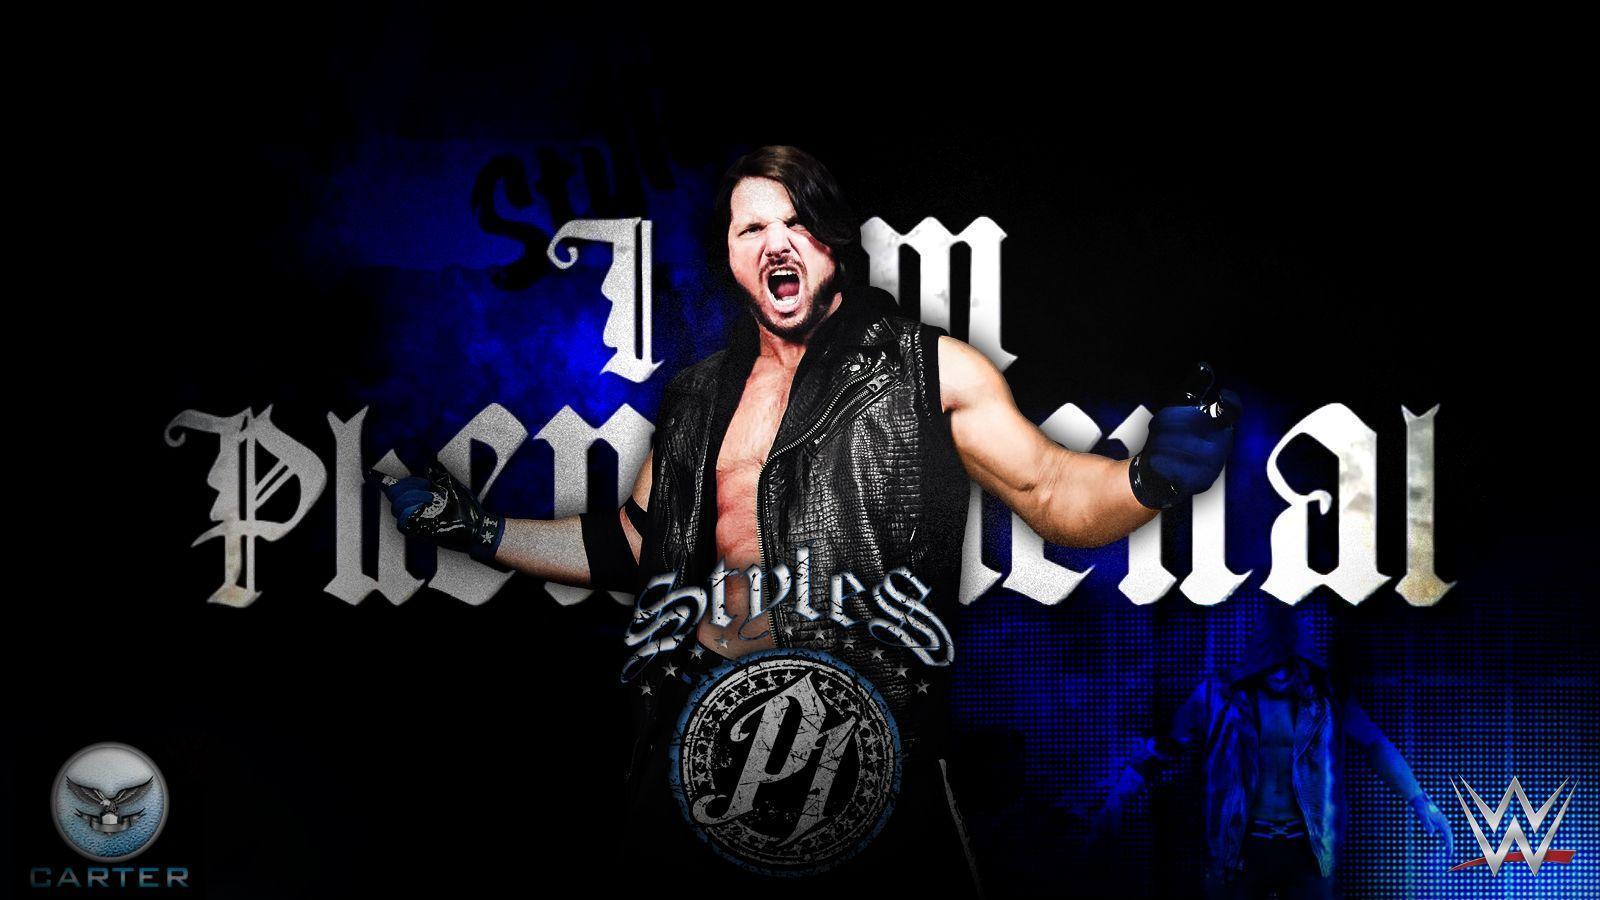 WWE Wrestler AJ Styles Wallpapers HD Pictures | One HD Wallpaper ...